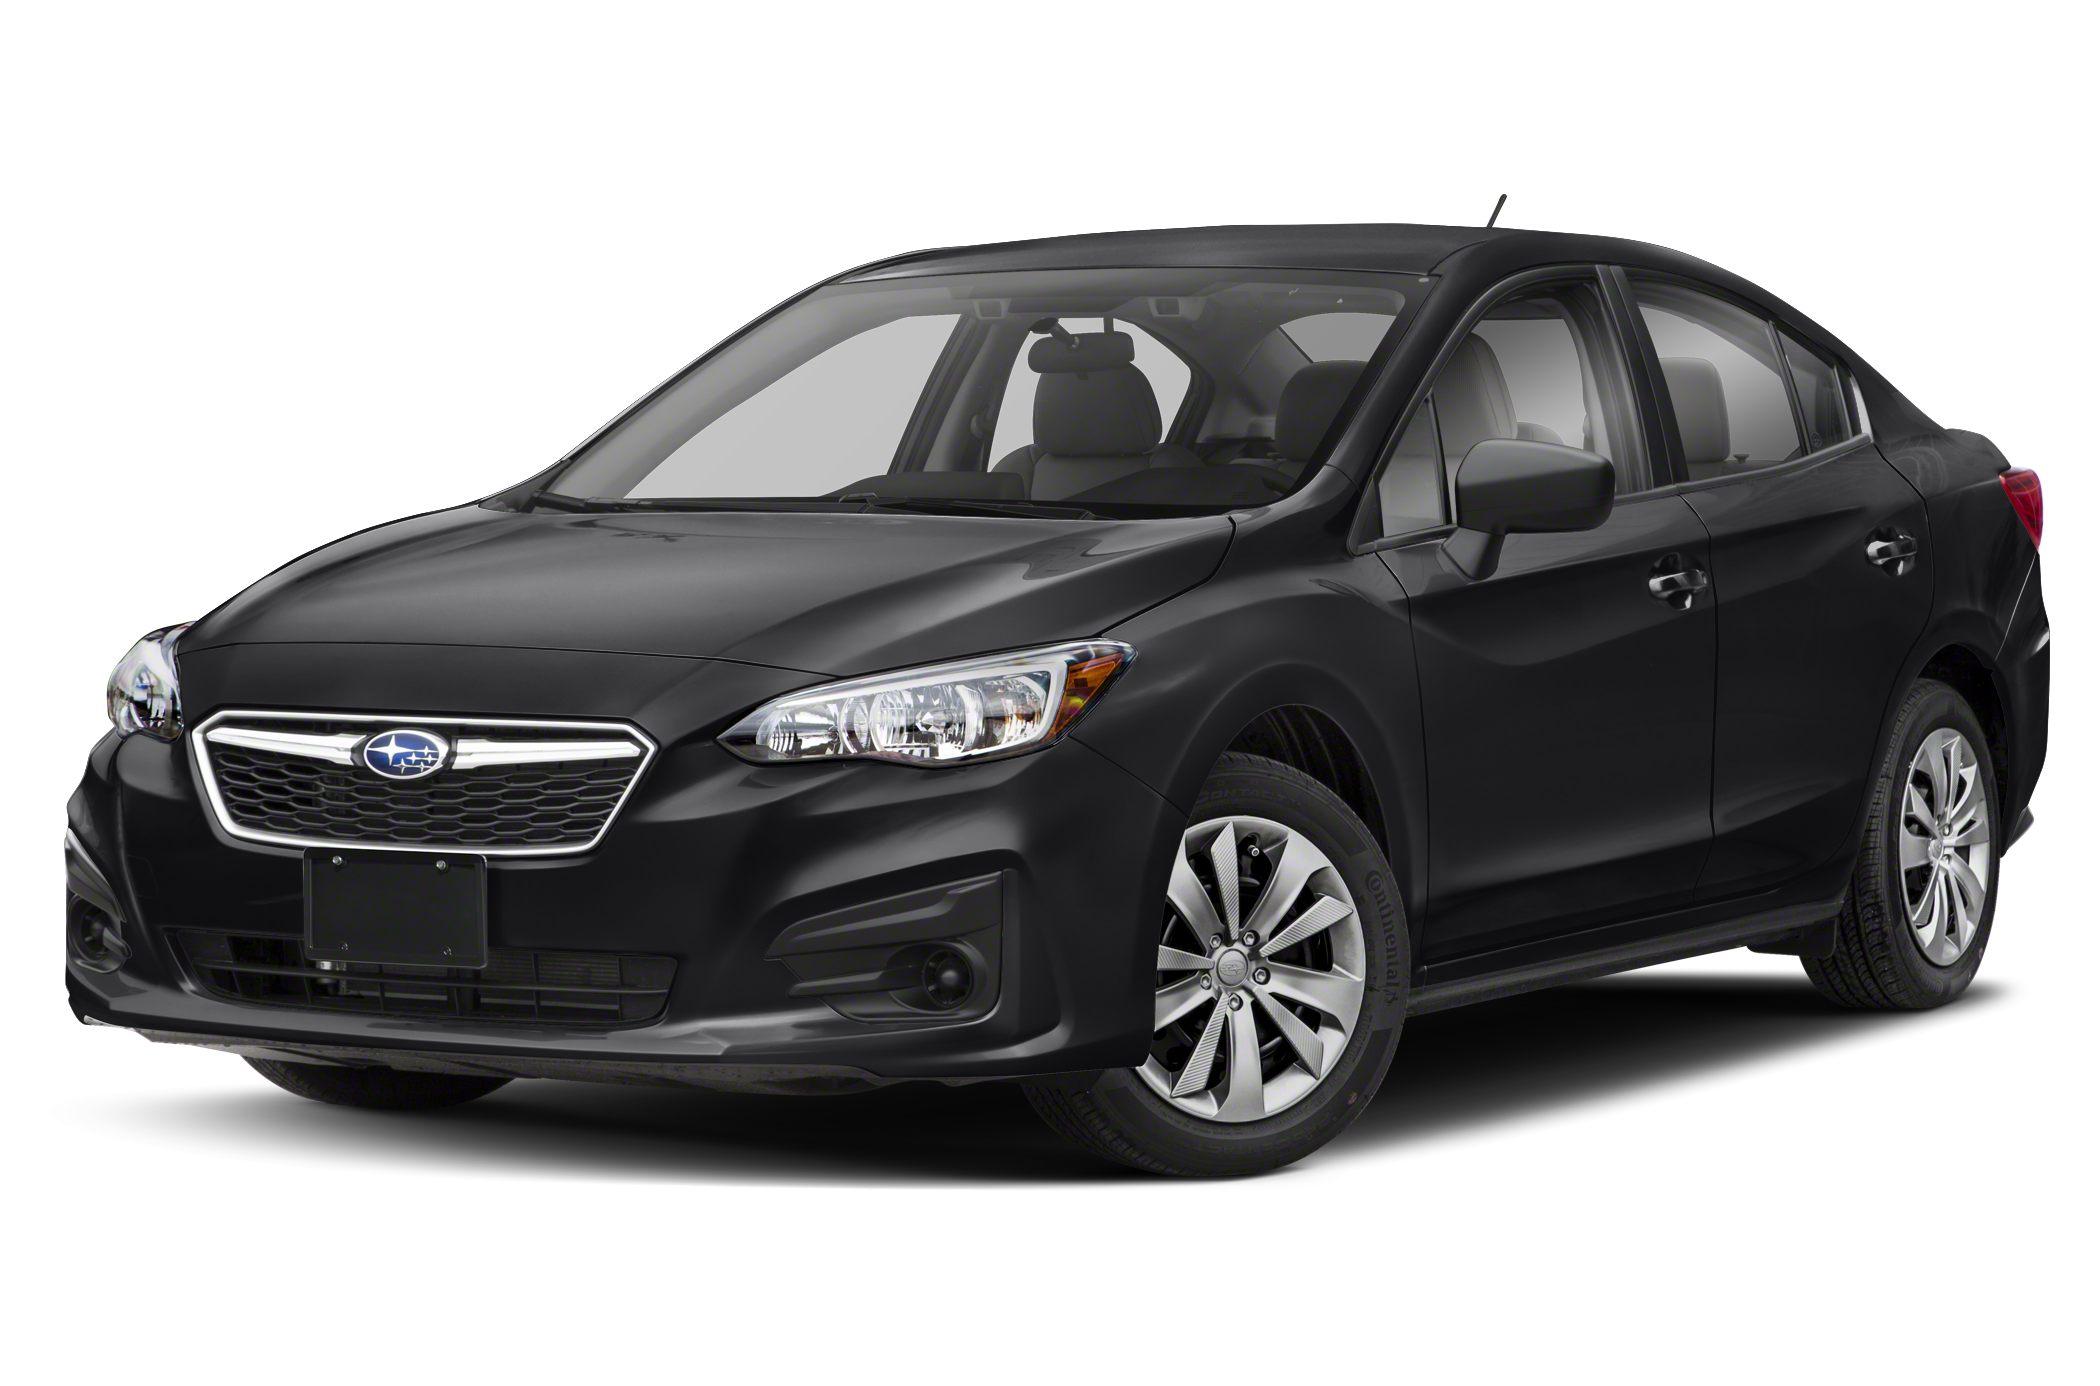 2019 Subaru Impreza 2.0i 4dr All-wheel Drive Sedan